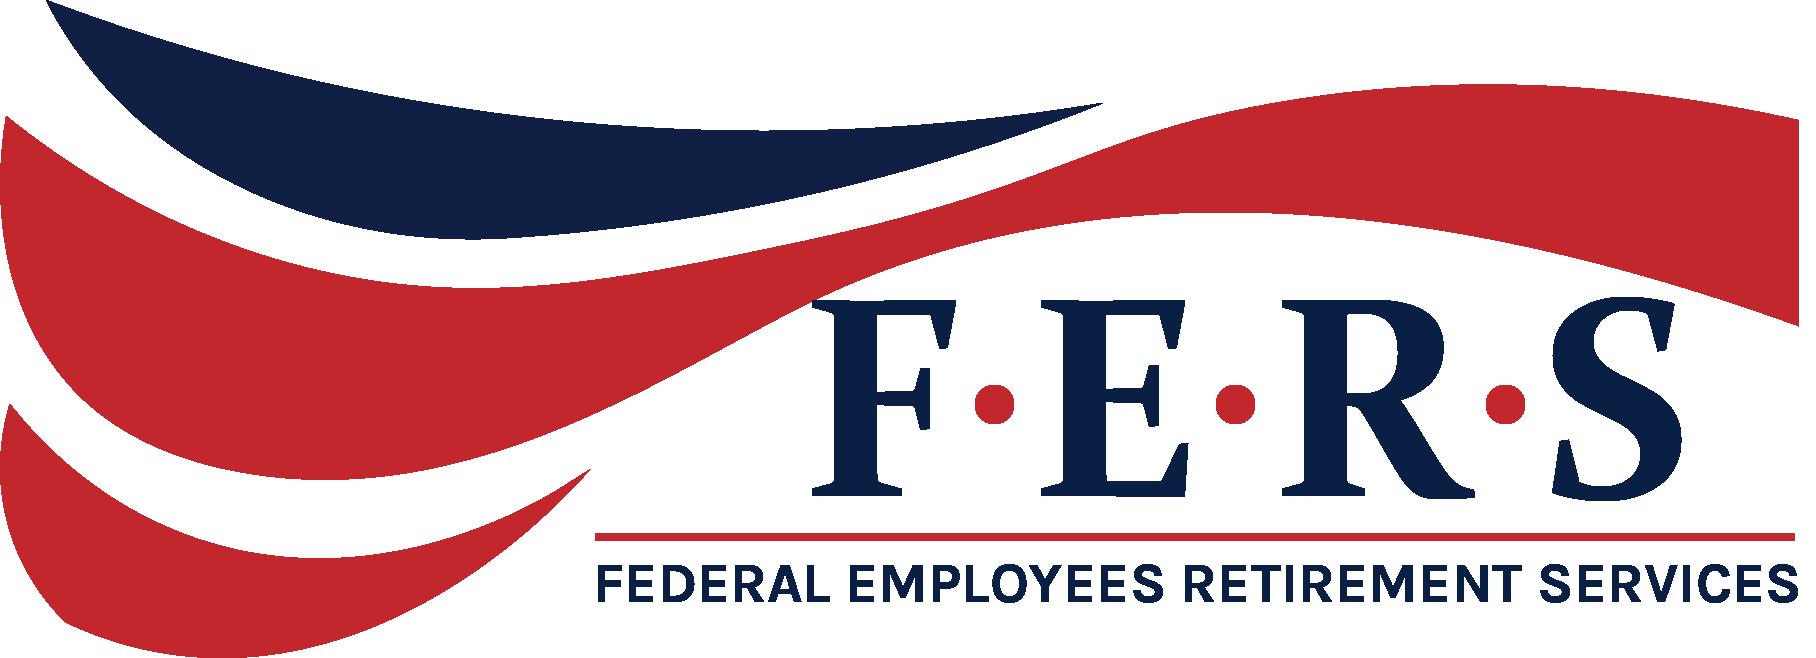 Employee clipart seminar. Announcement coming soon federal